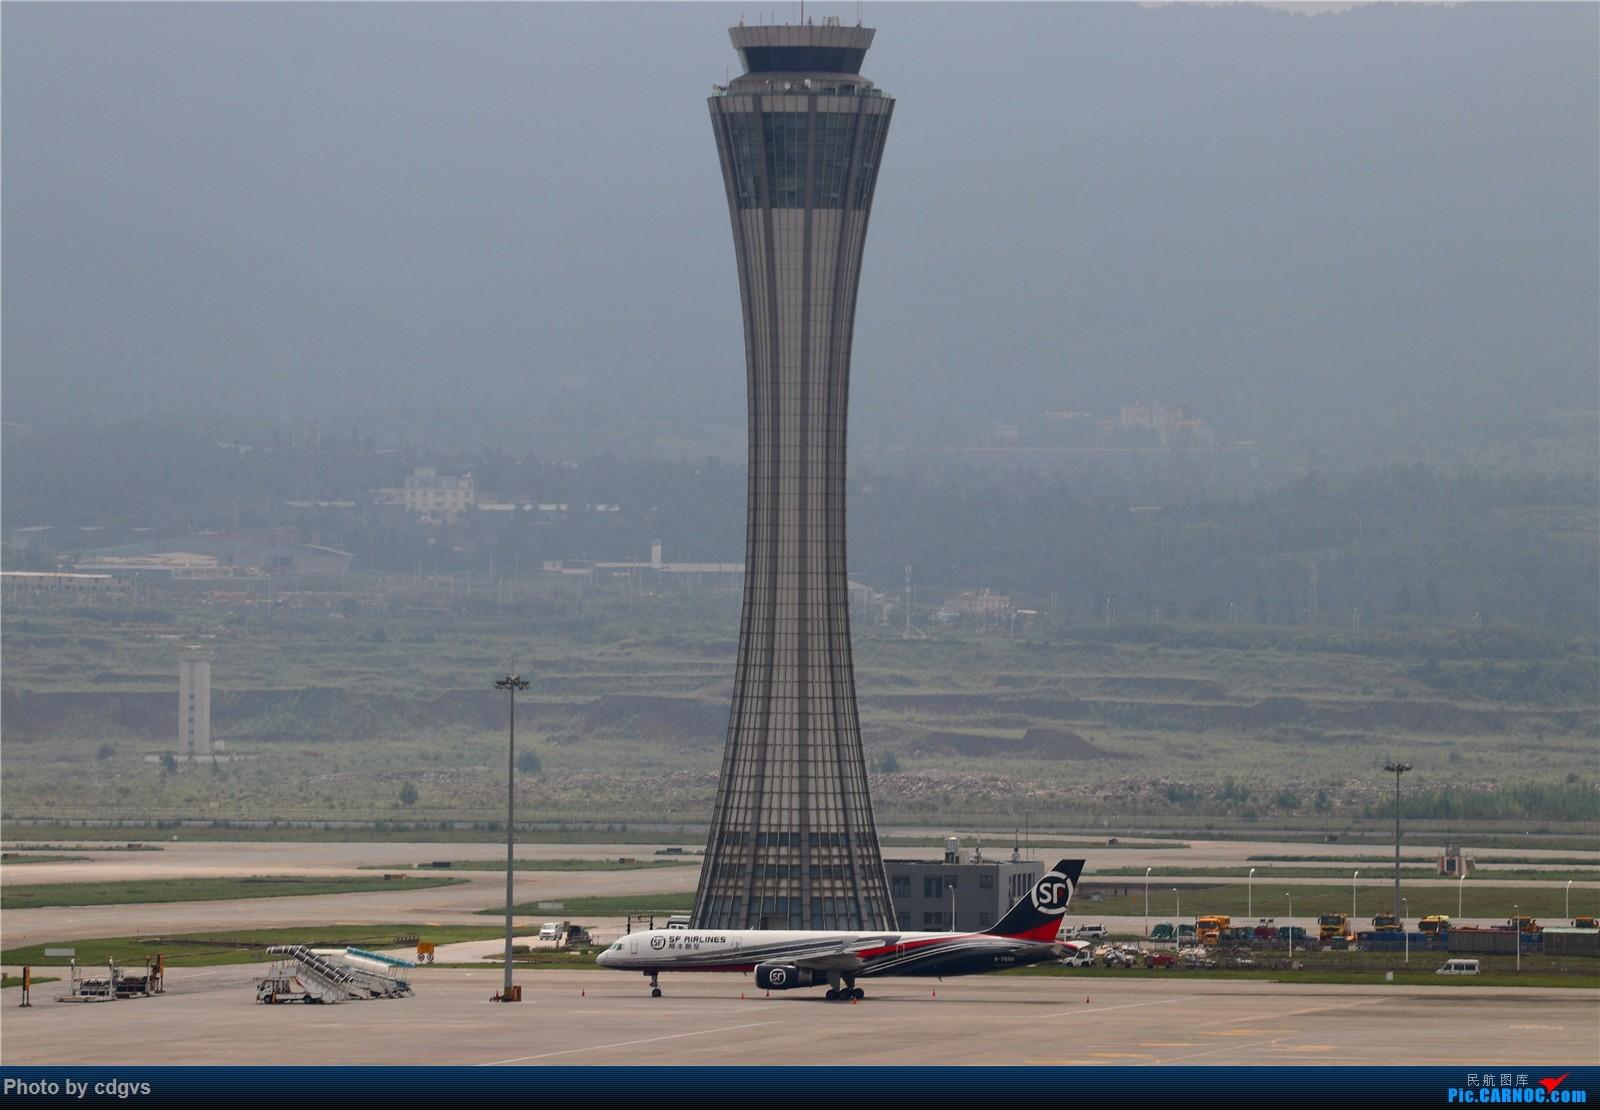 Re:[原创]【KMG】长水机场一组 1600大图 AIRBUS A321-200 B-1812 中国昆明长水国际机场 中国昆明长水国际机场